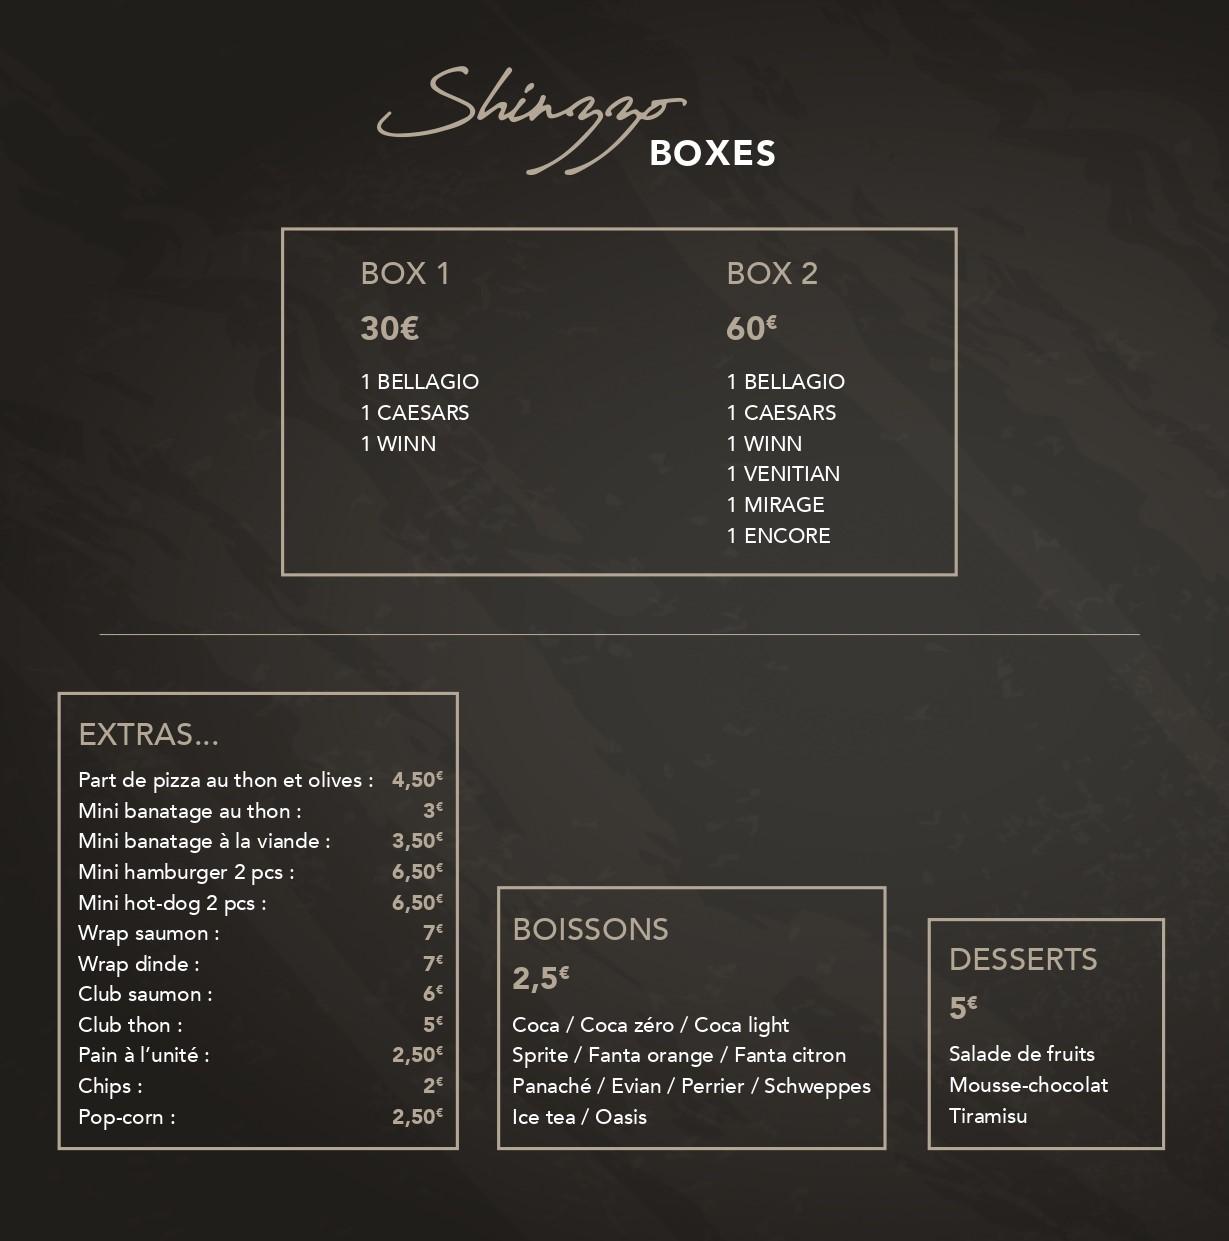 Boxes Shinzzo